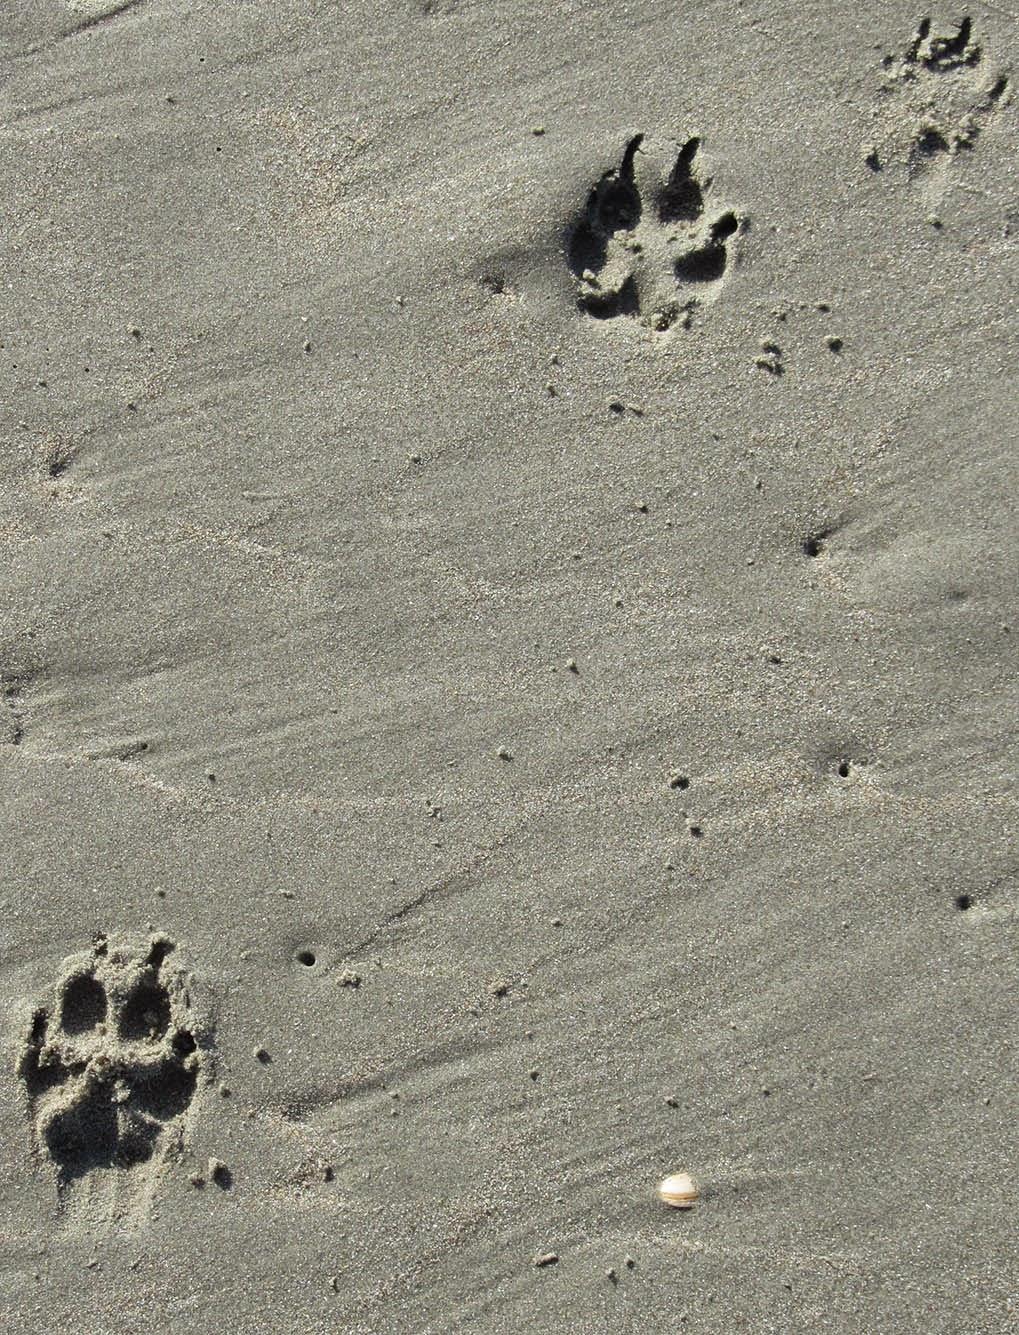 three paw prints